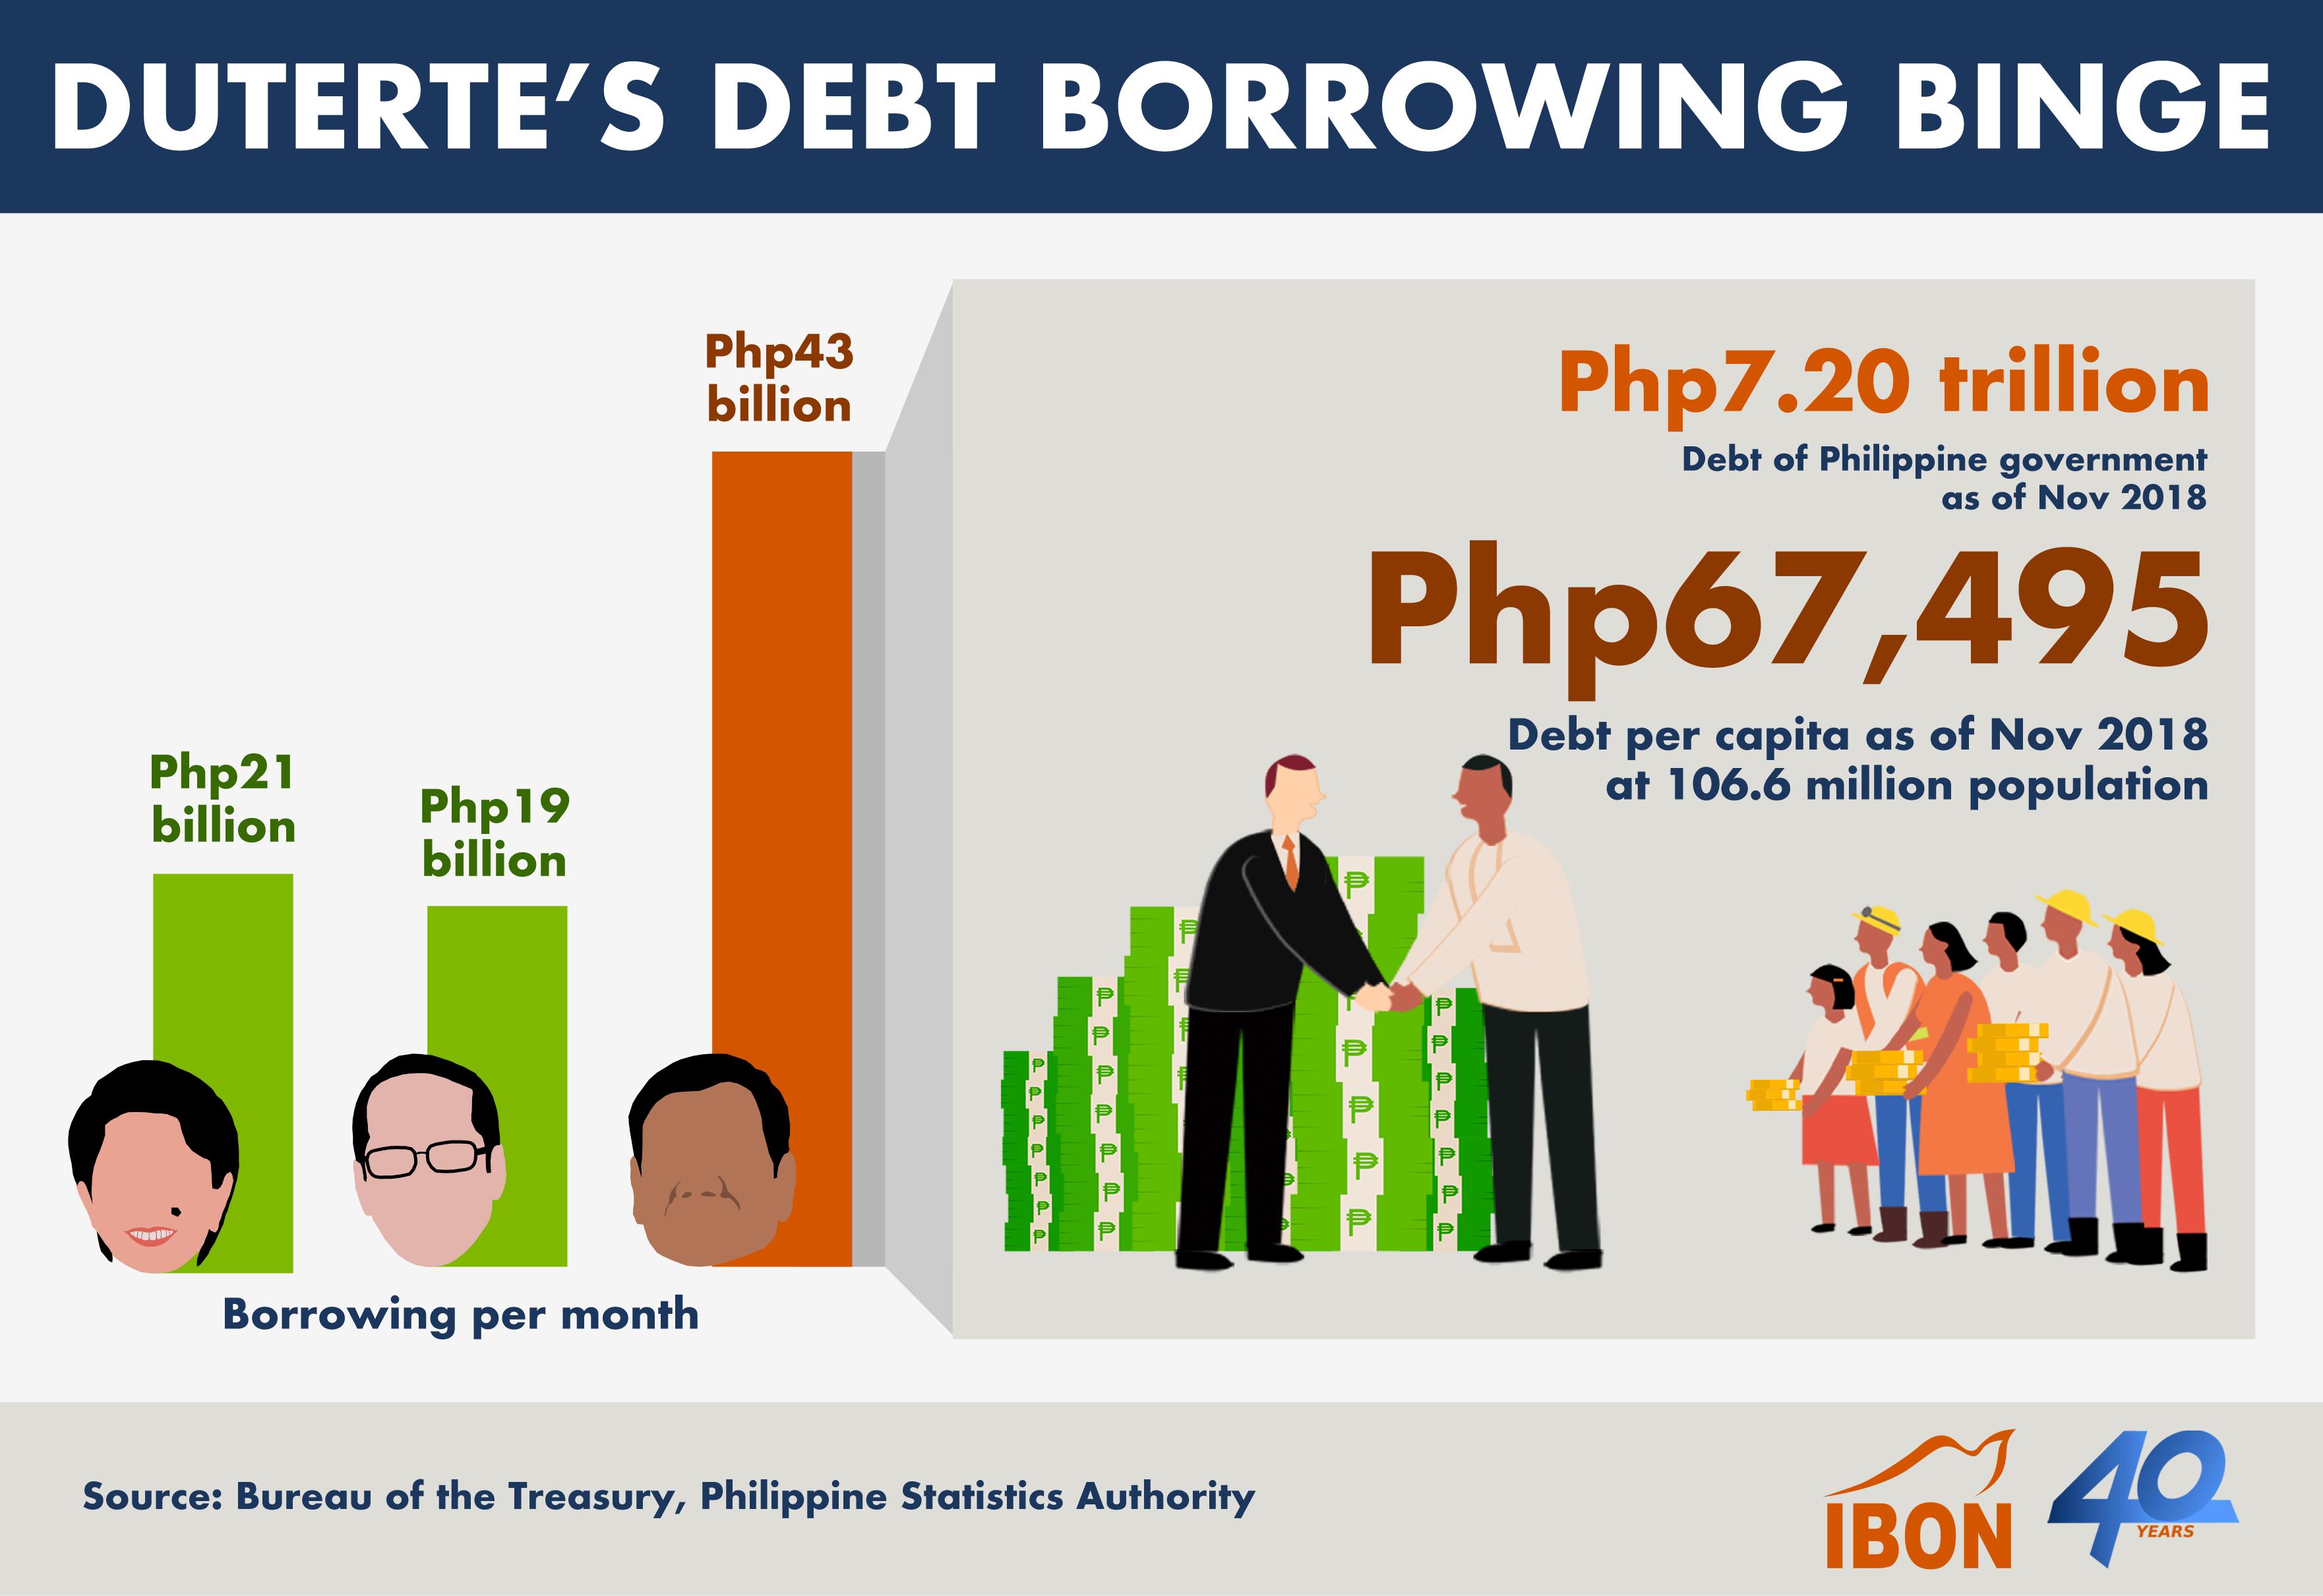 2019_0115_Duterte's Debt Borrowing Binge